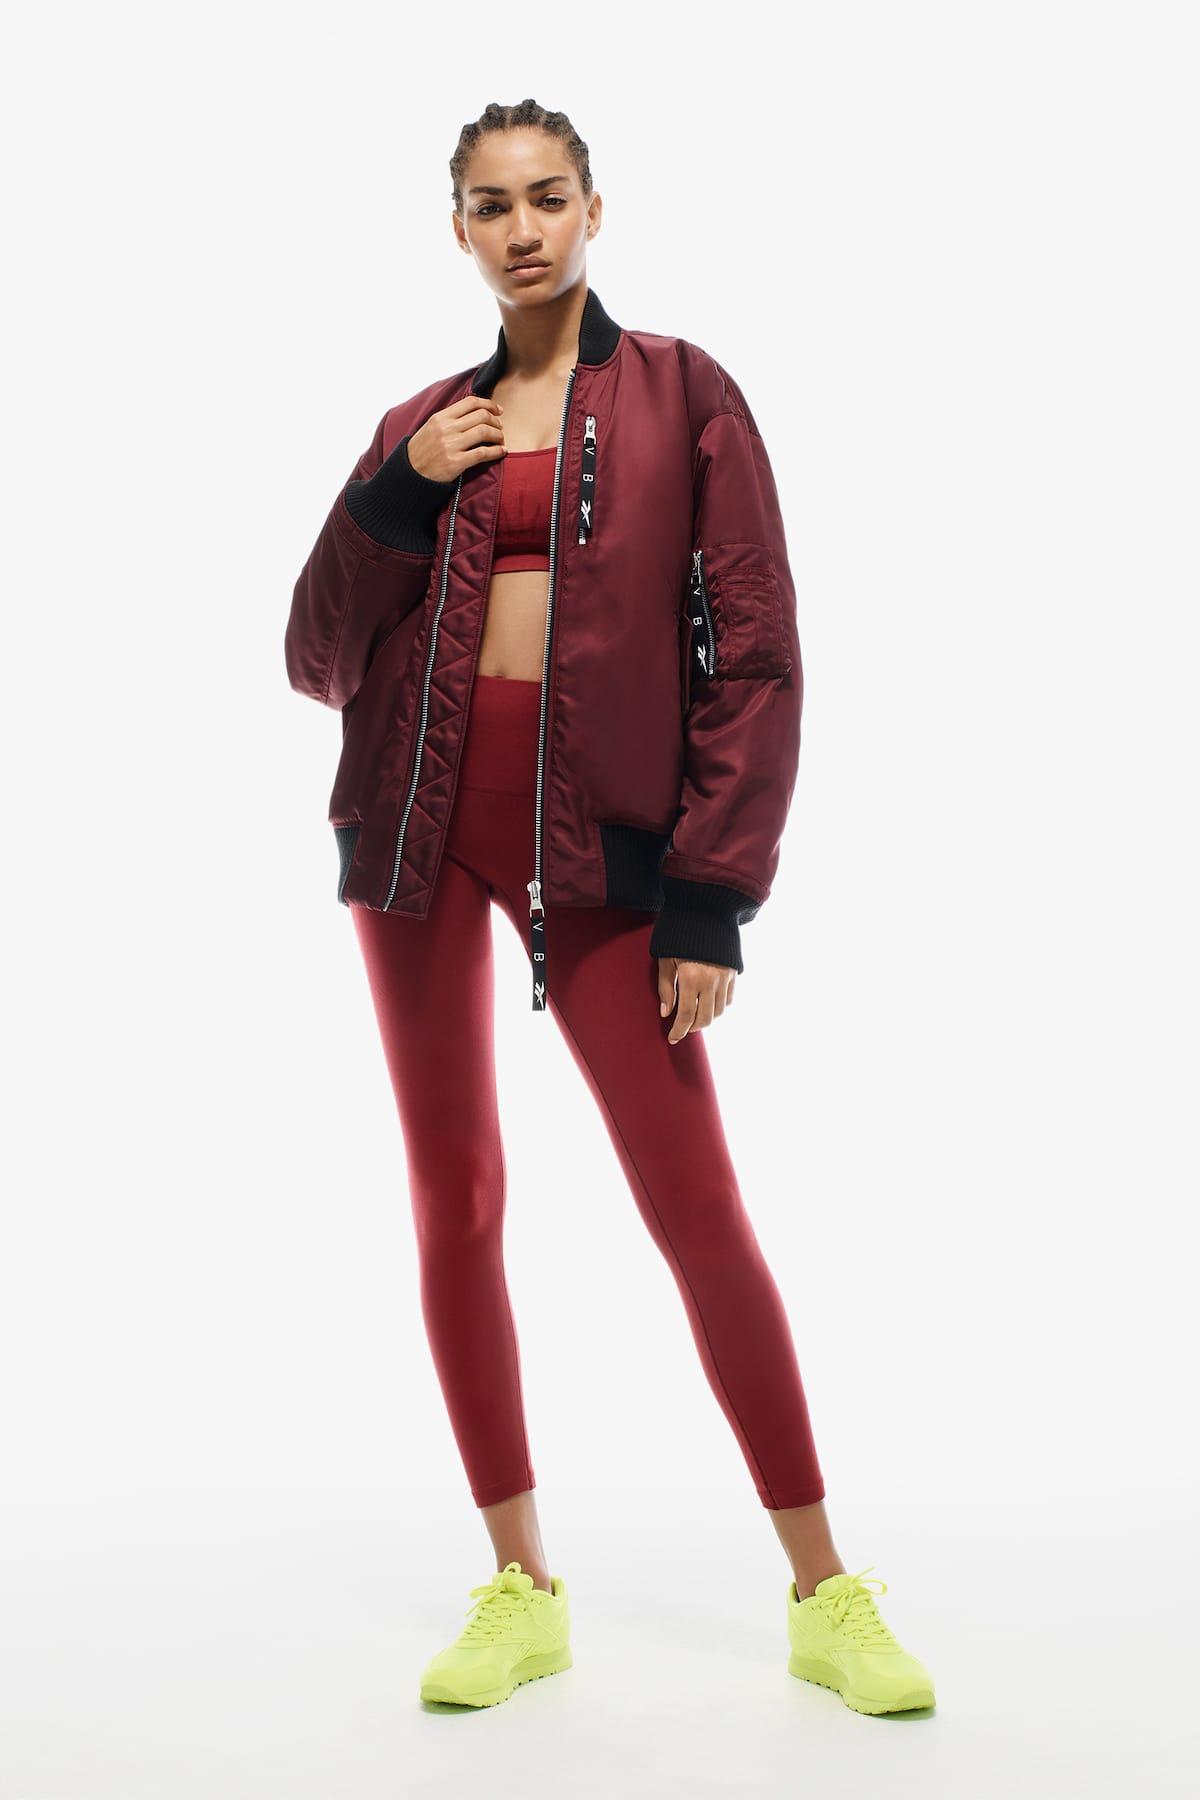 Victoria Beckham x Reebok Collection